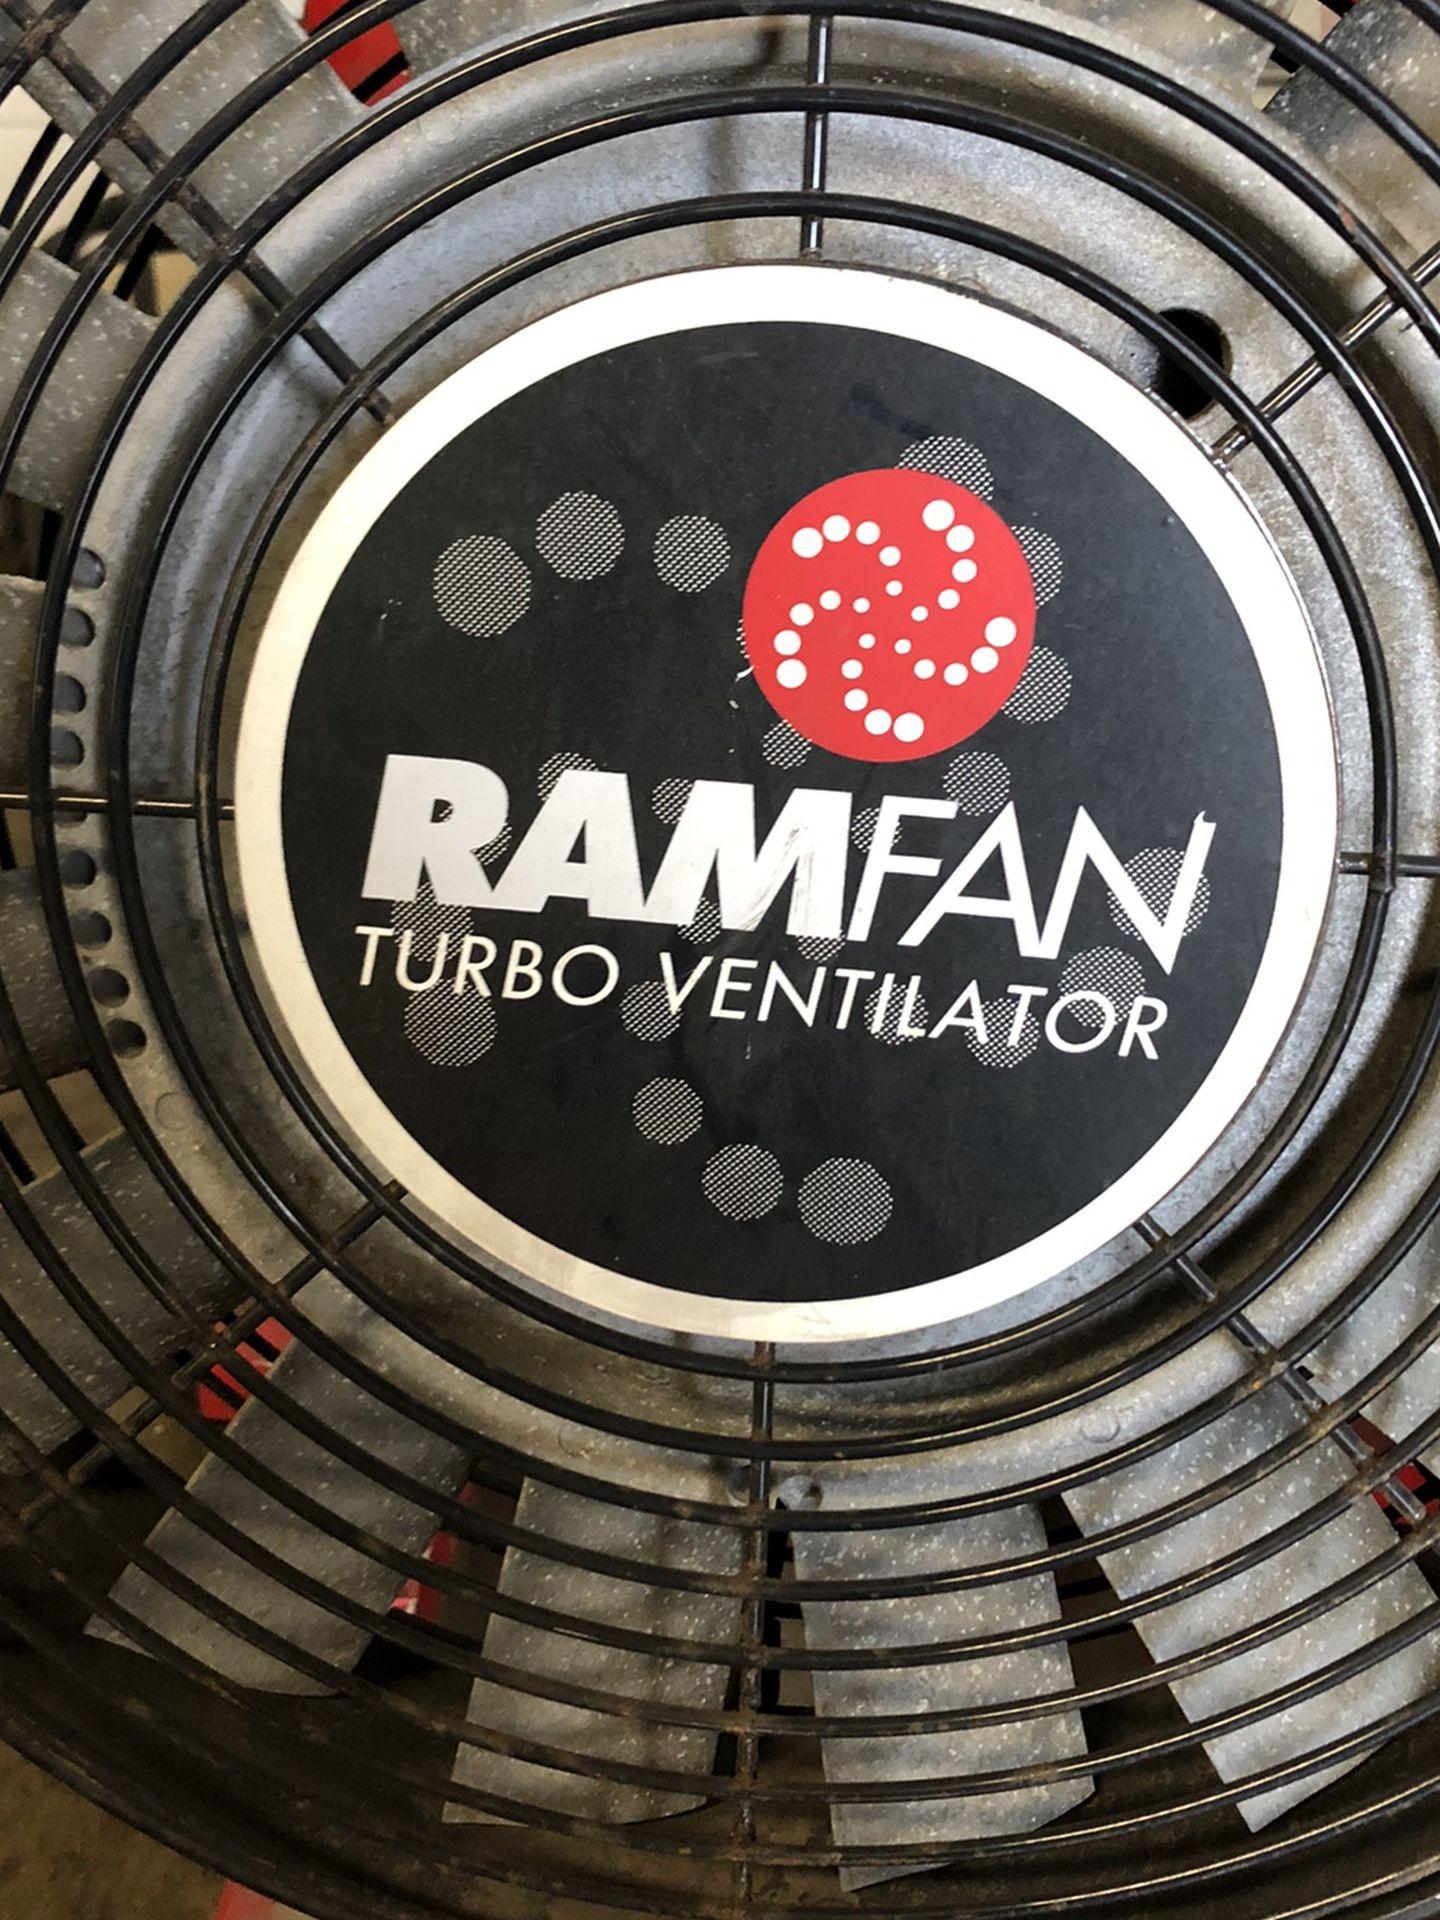 Ramfan Turbo Ventilator 100$ Serious Inquiries Only